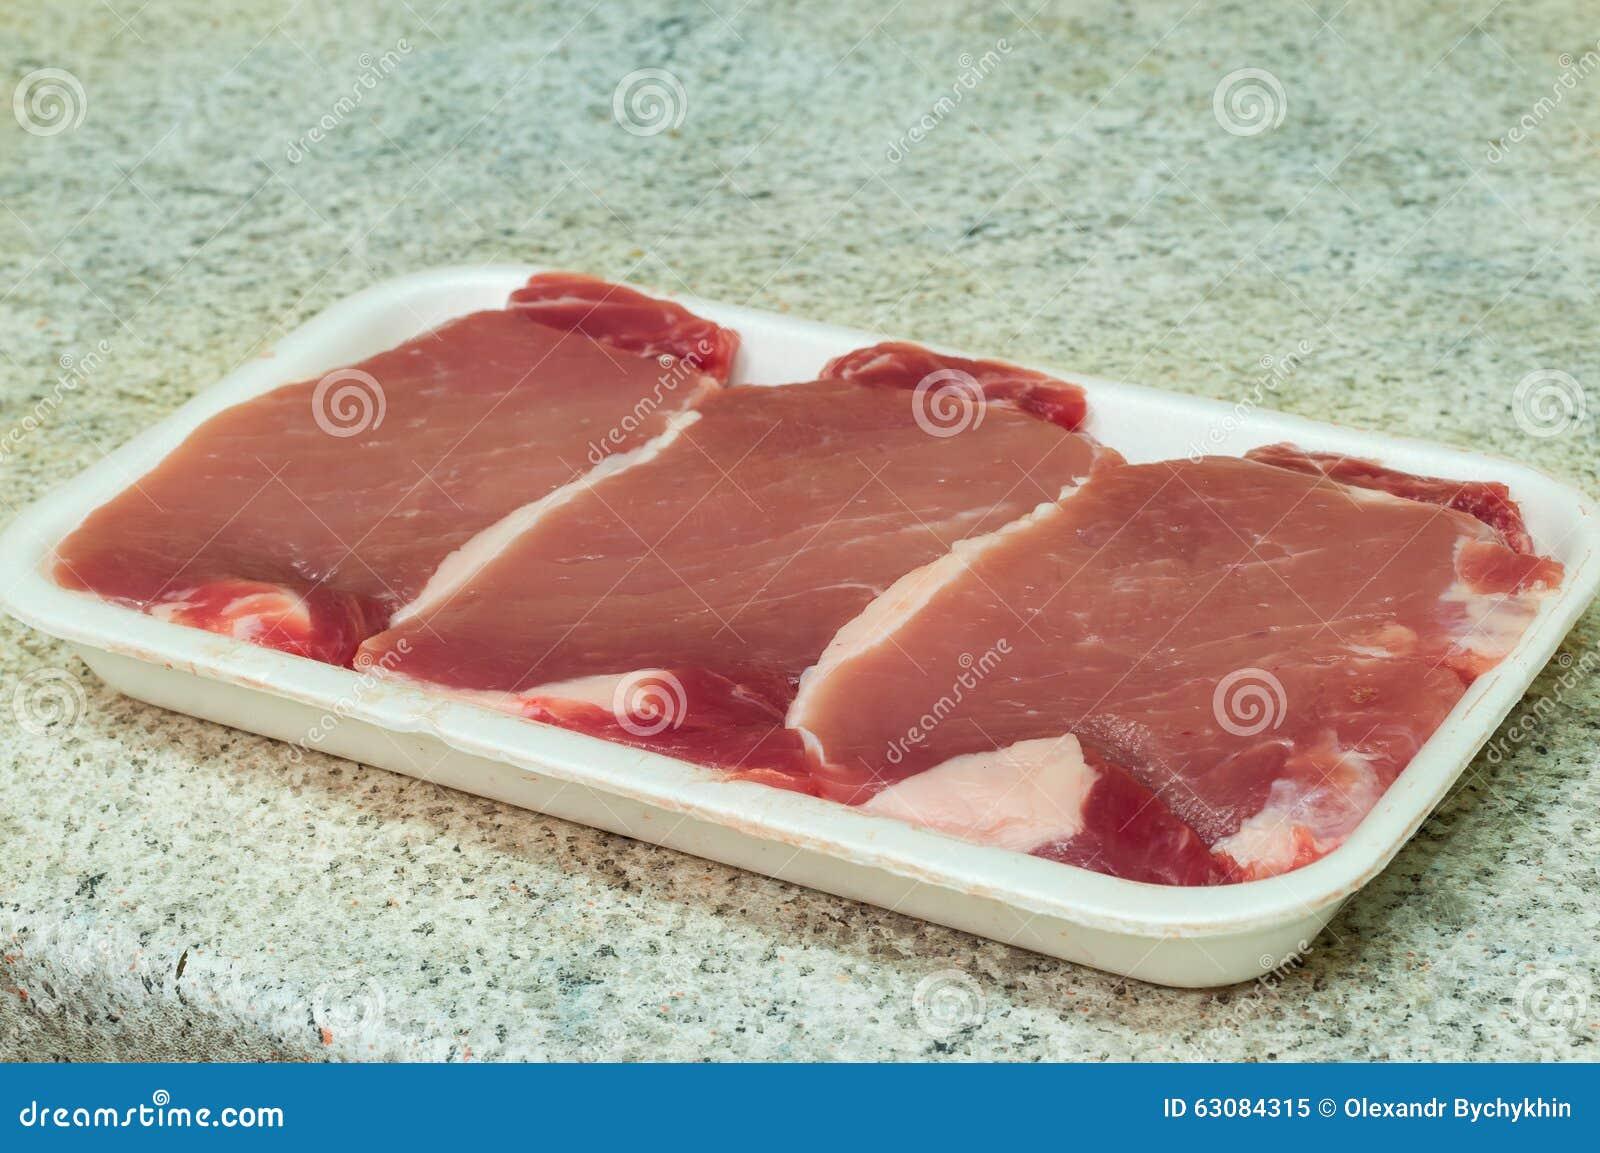 Download Les Tranches De Bifteck De Boeuf Sur La Viande Bifurquent En Emballage Dessus Image stock - Image du évaluation, emballage: 63084315